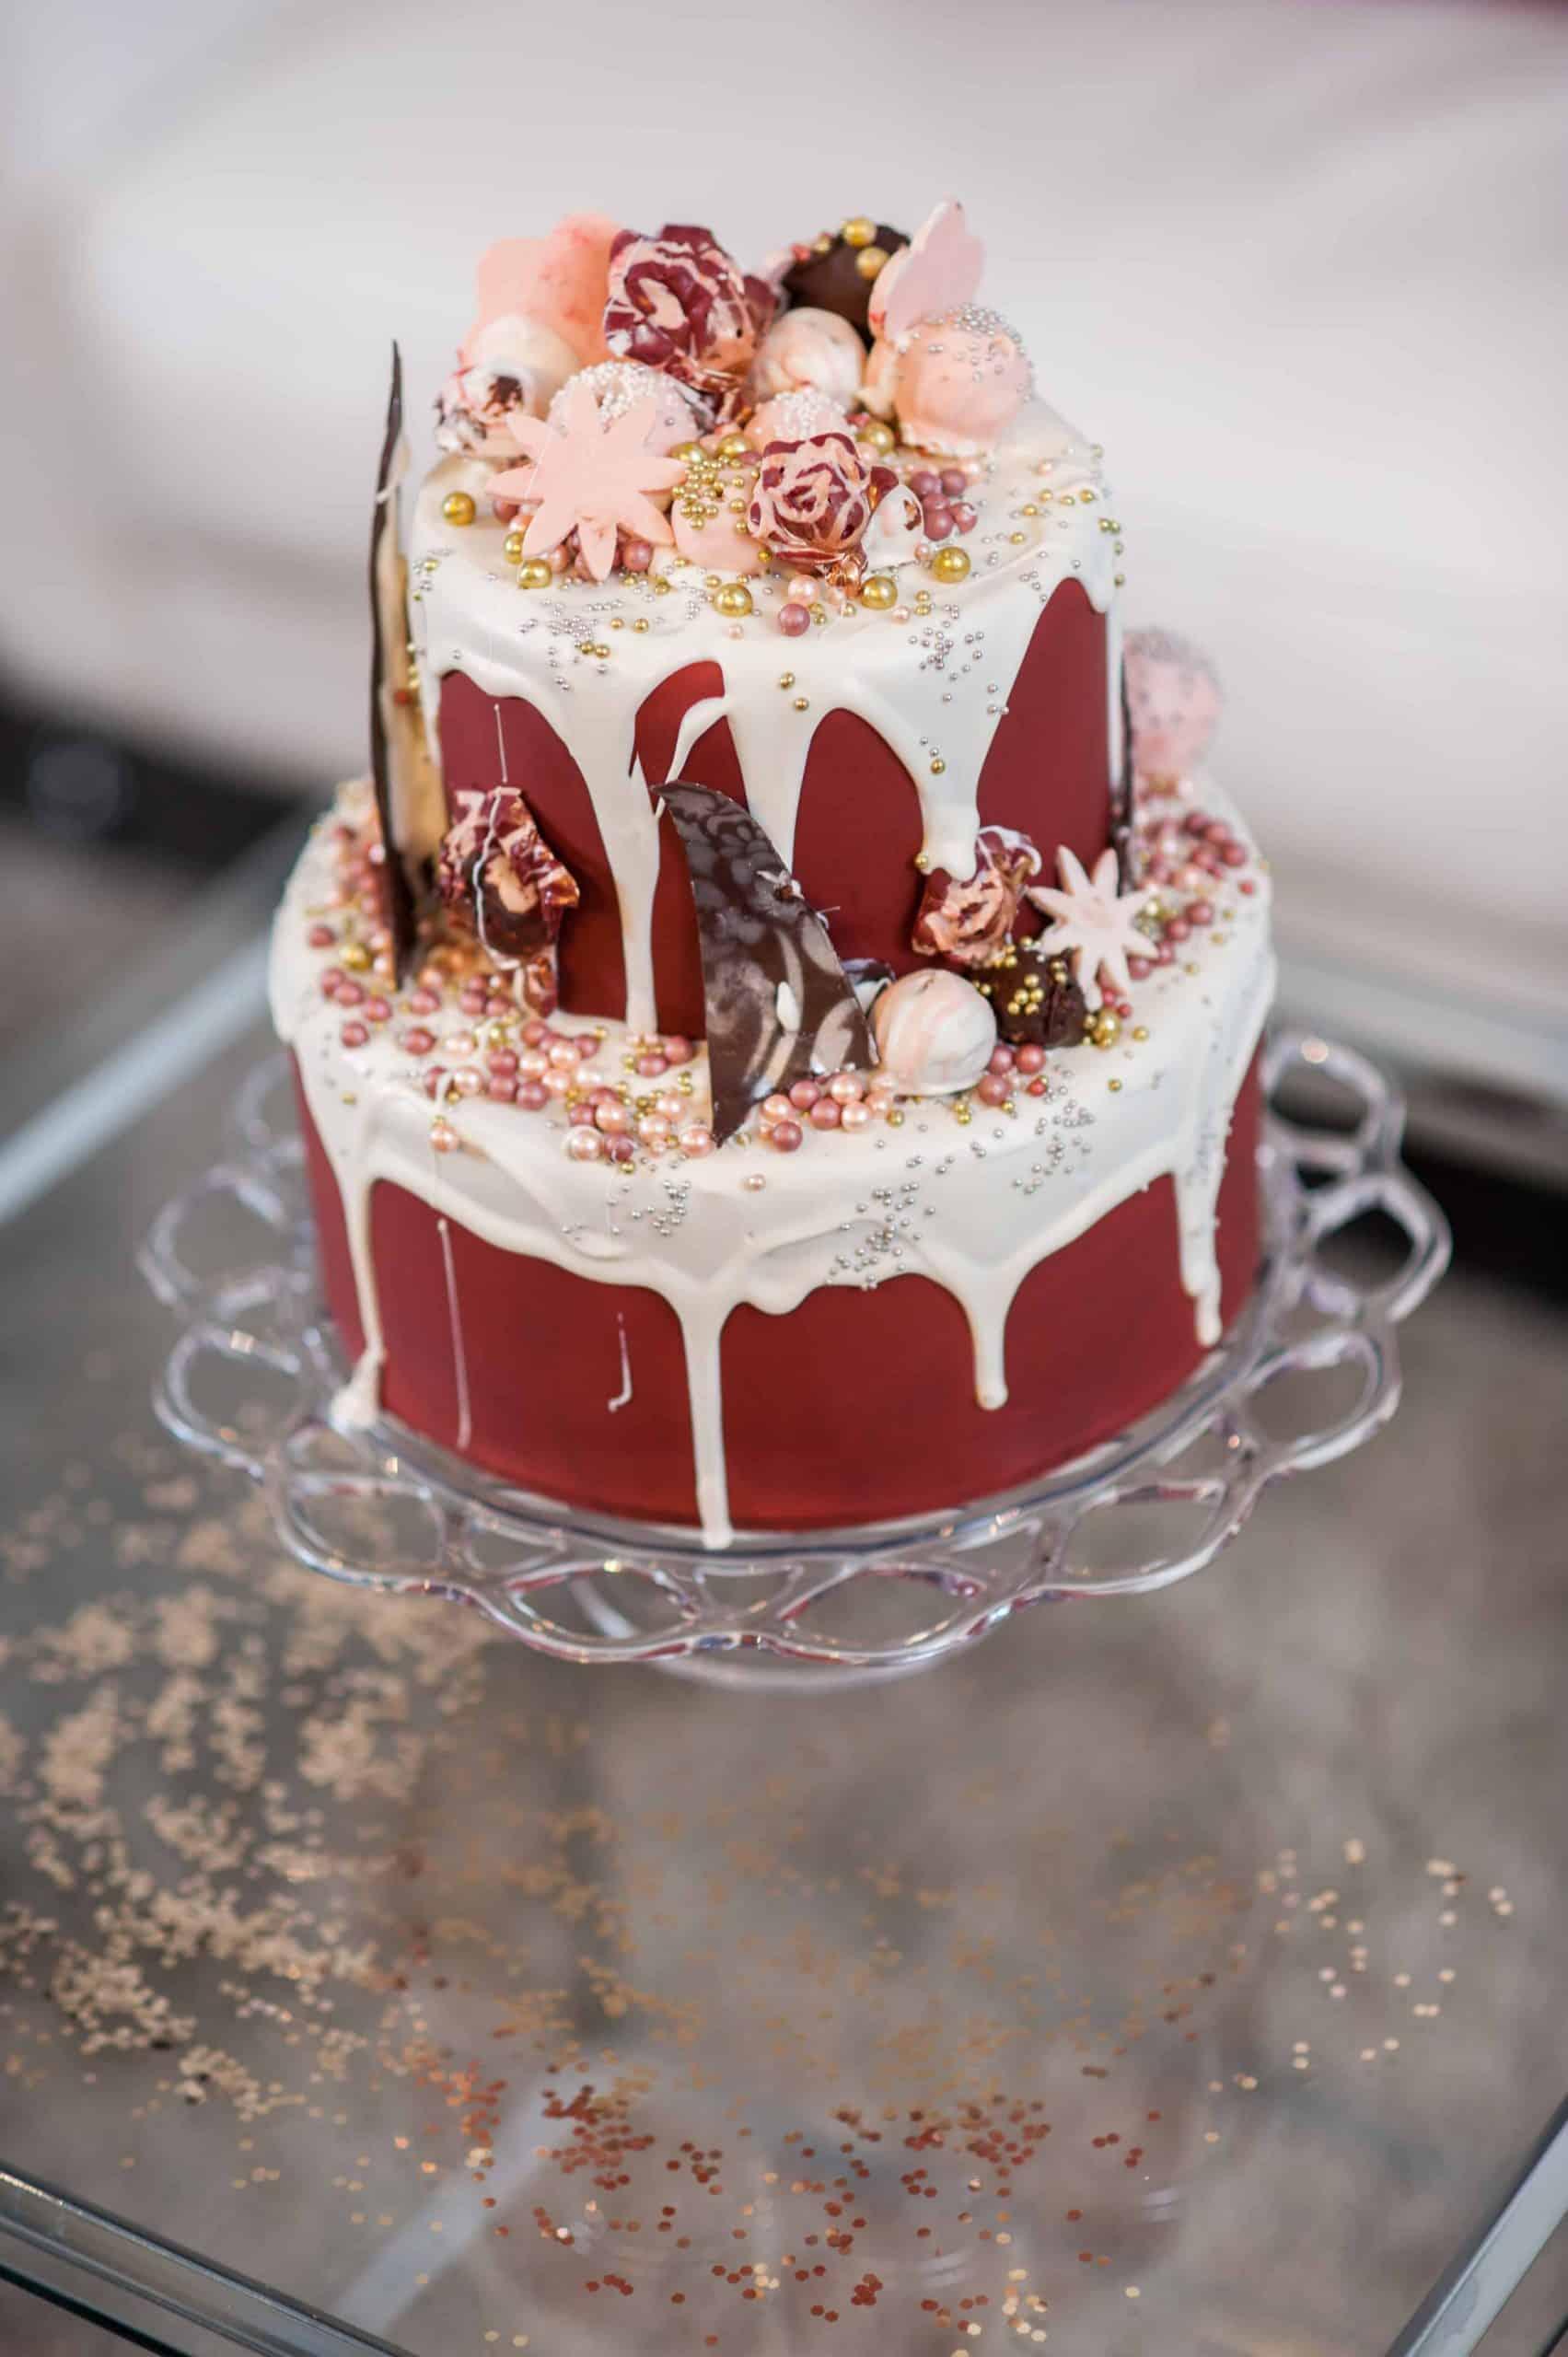 The Makery Cake Company White Chocolate and Burgundy Drip Cake